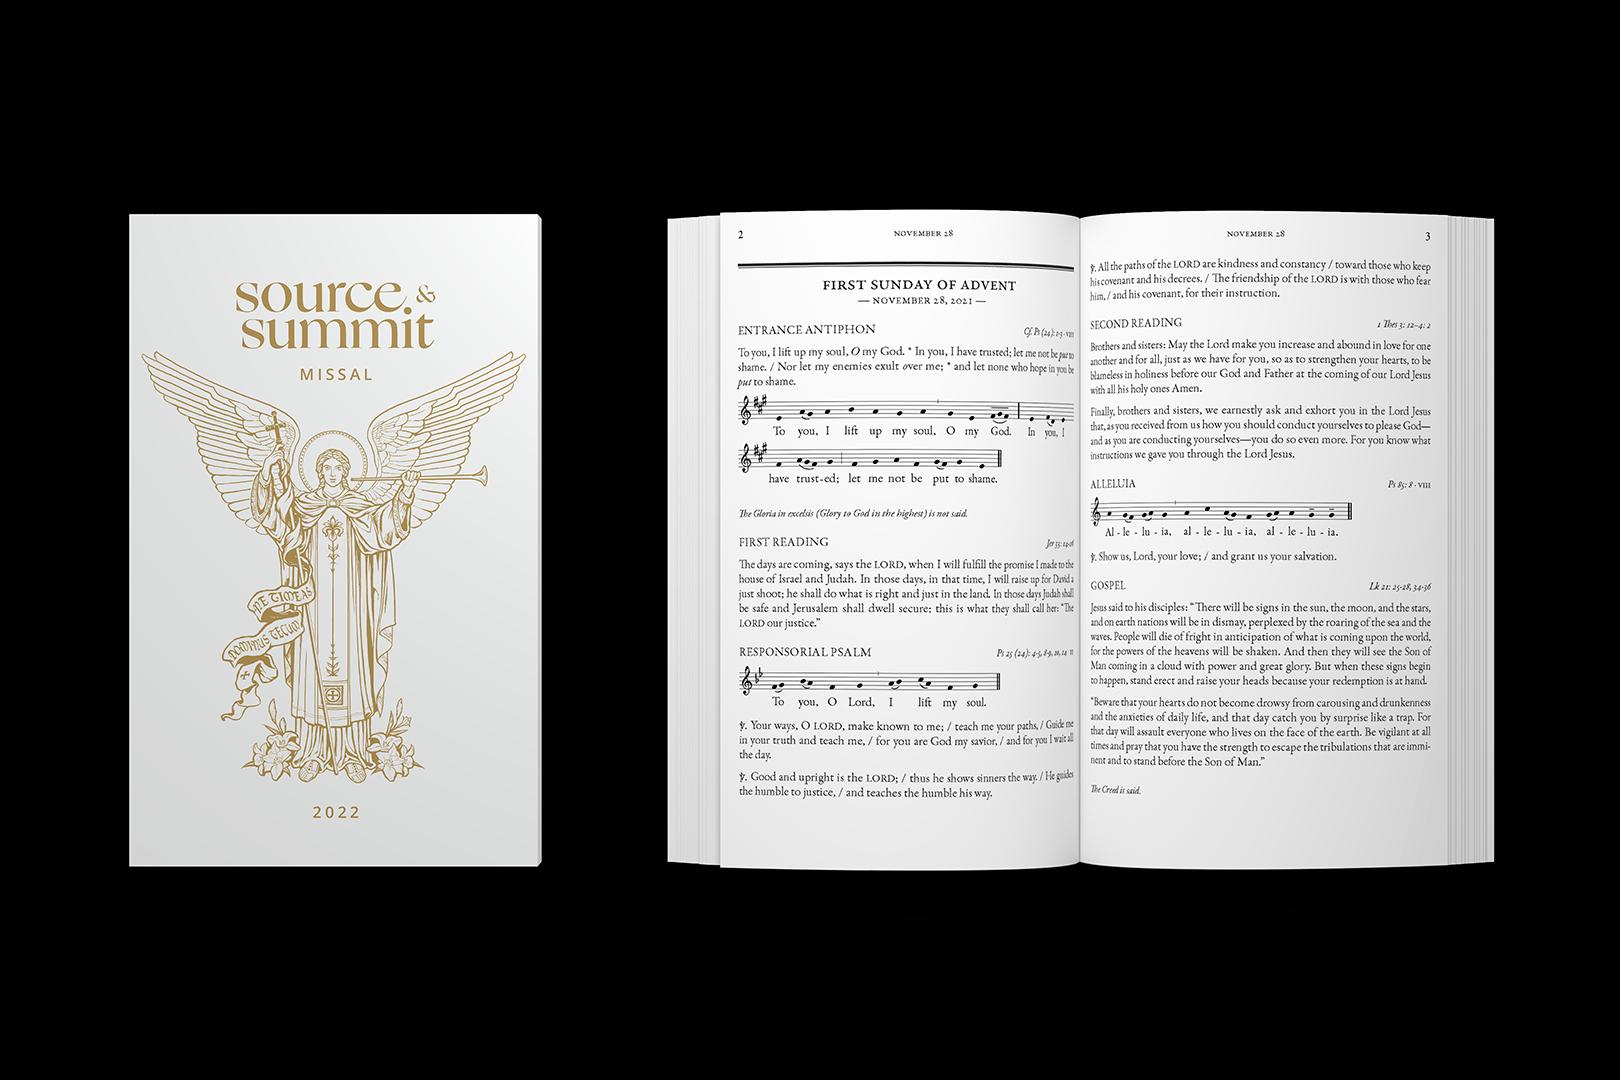 Catholic Missal Source & Summit 2021